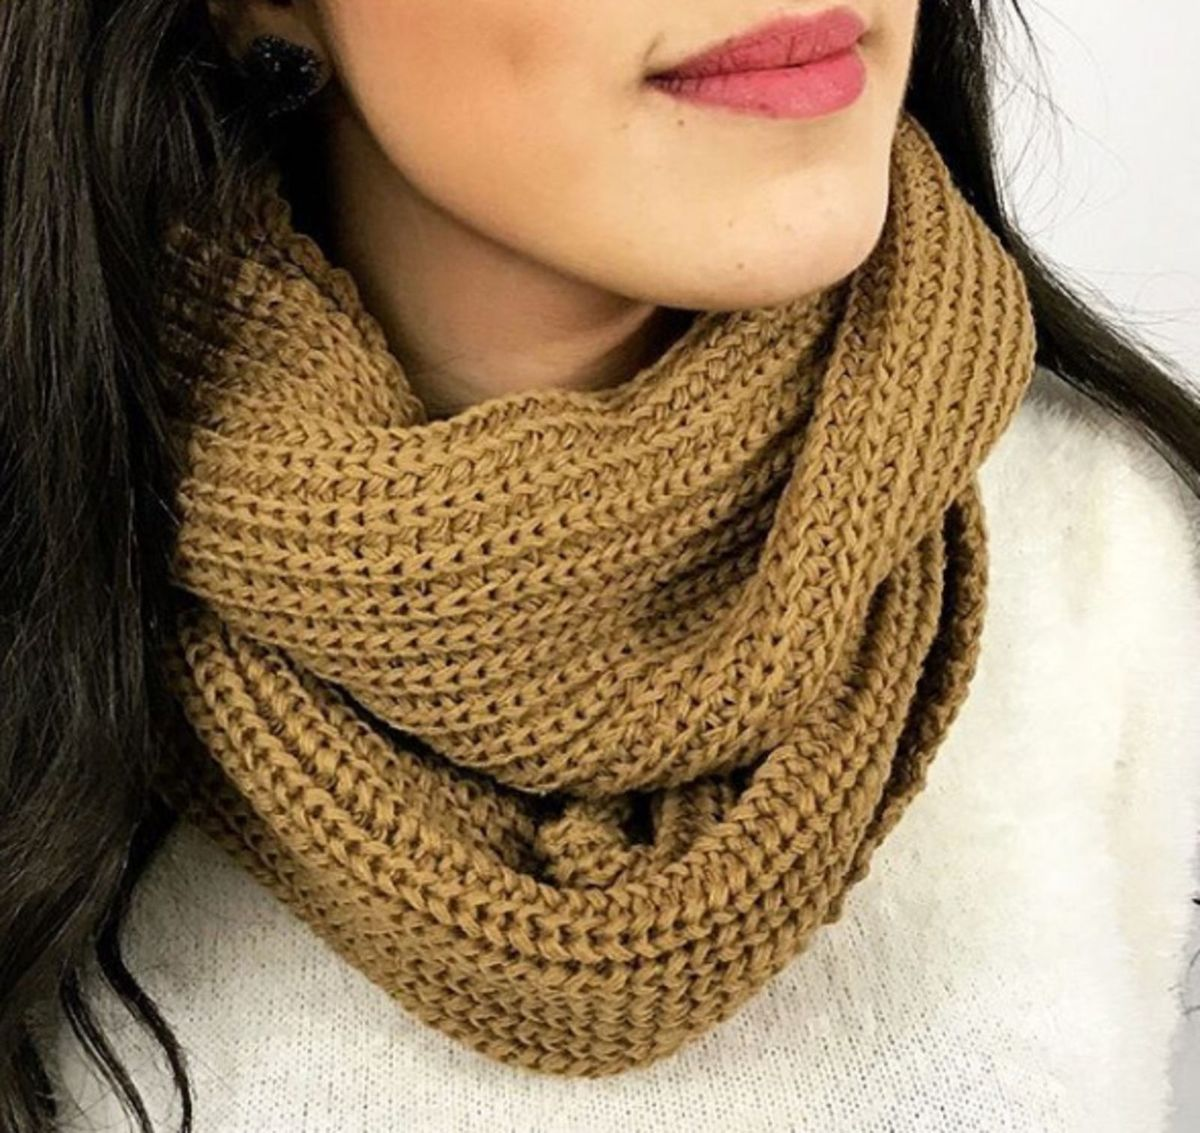 lenço gola tricot - lenços sem marca